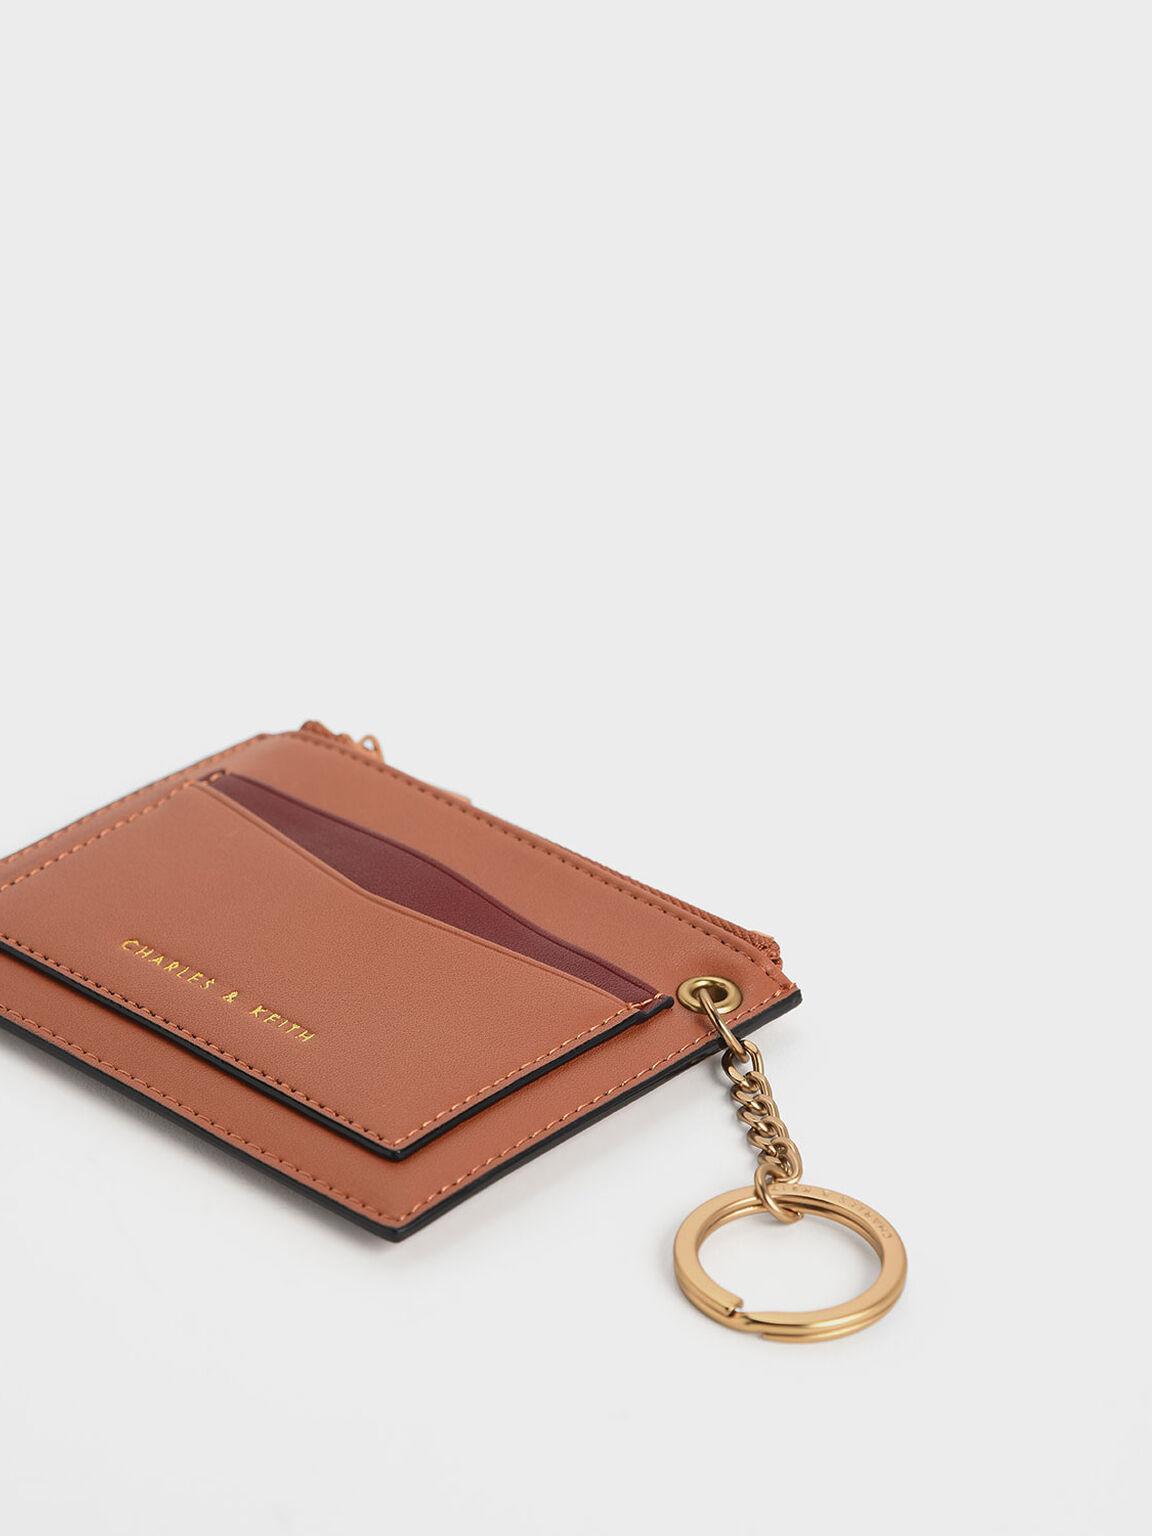 Two-Tone Zip Pocket Card Holder, Tan, hi-res